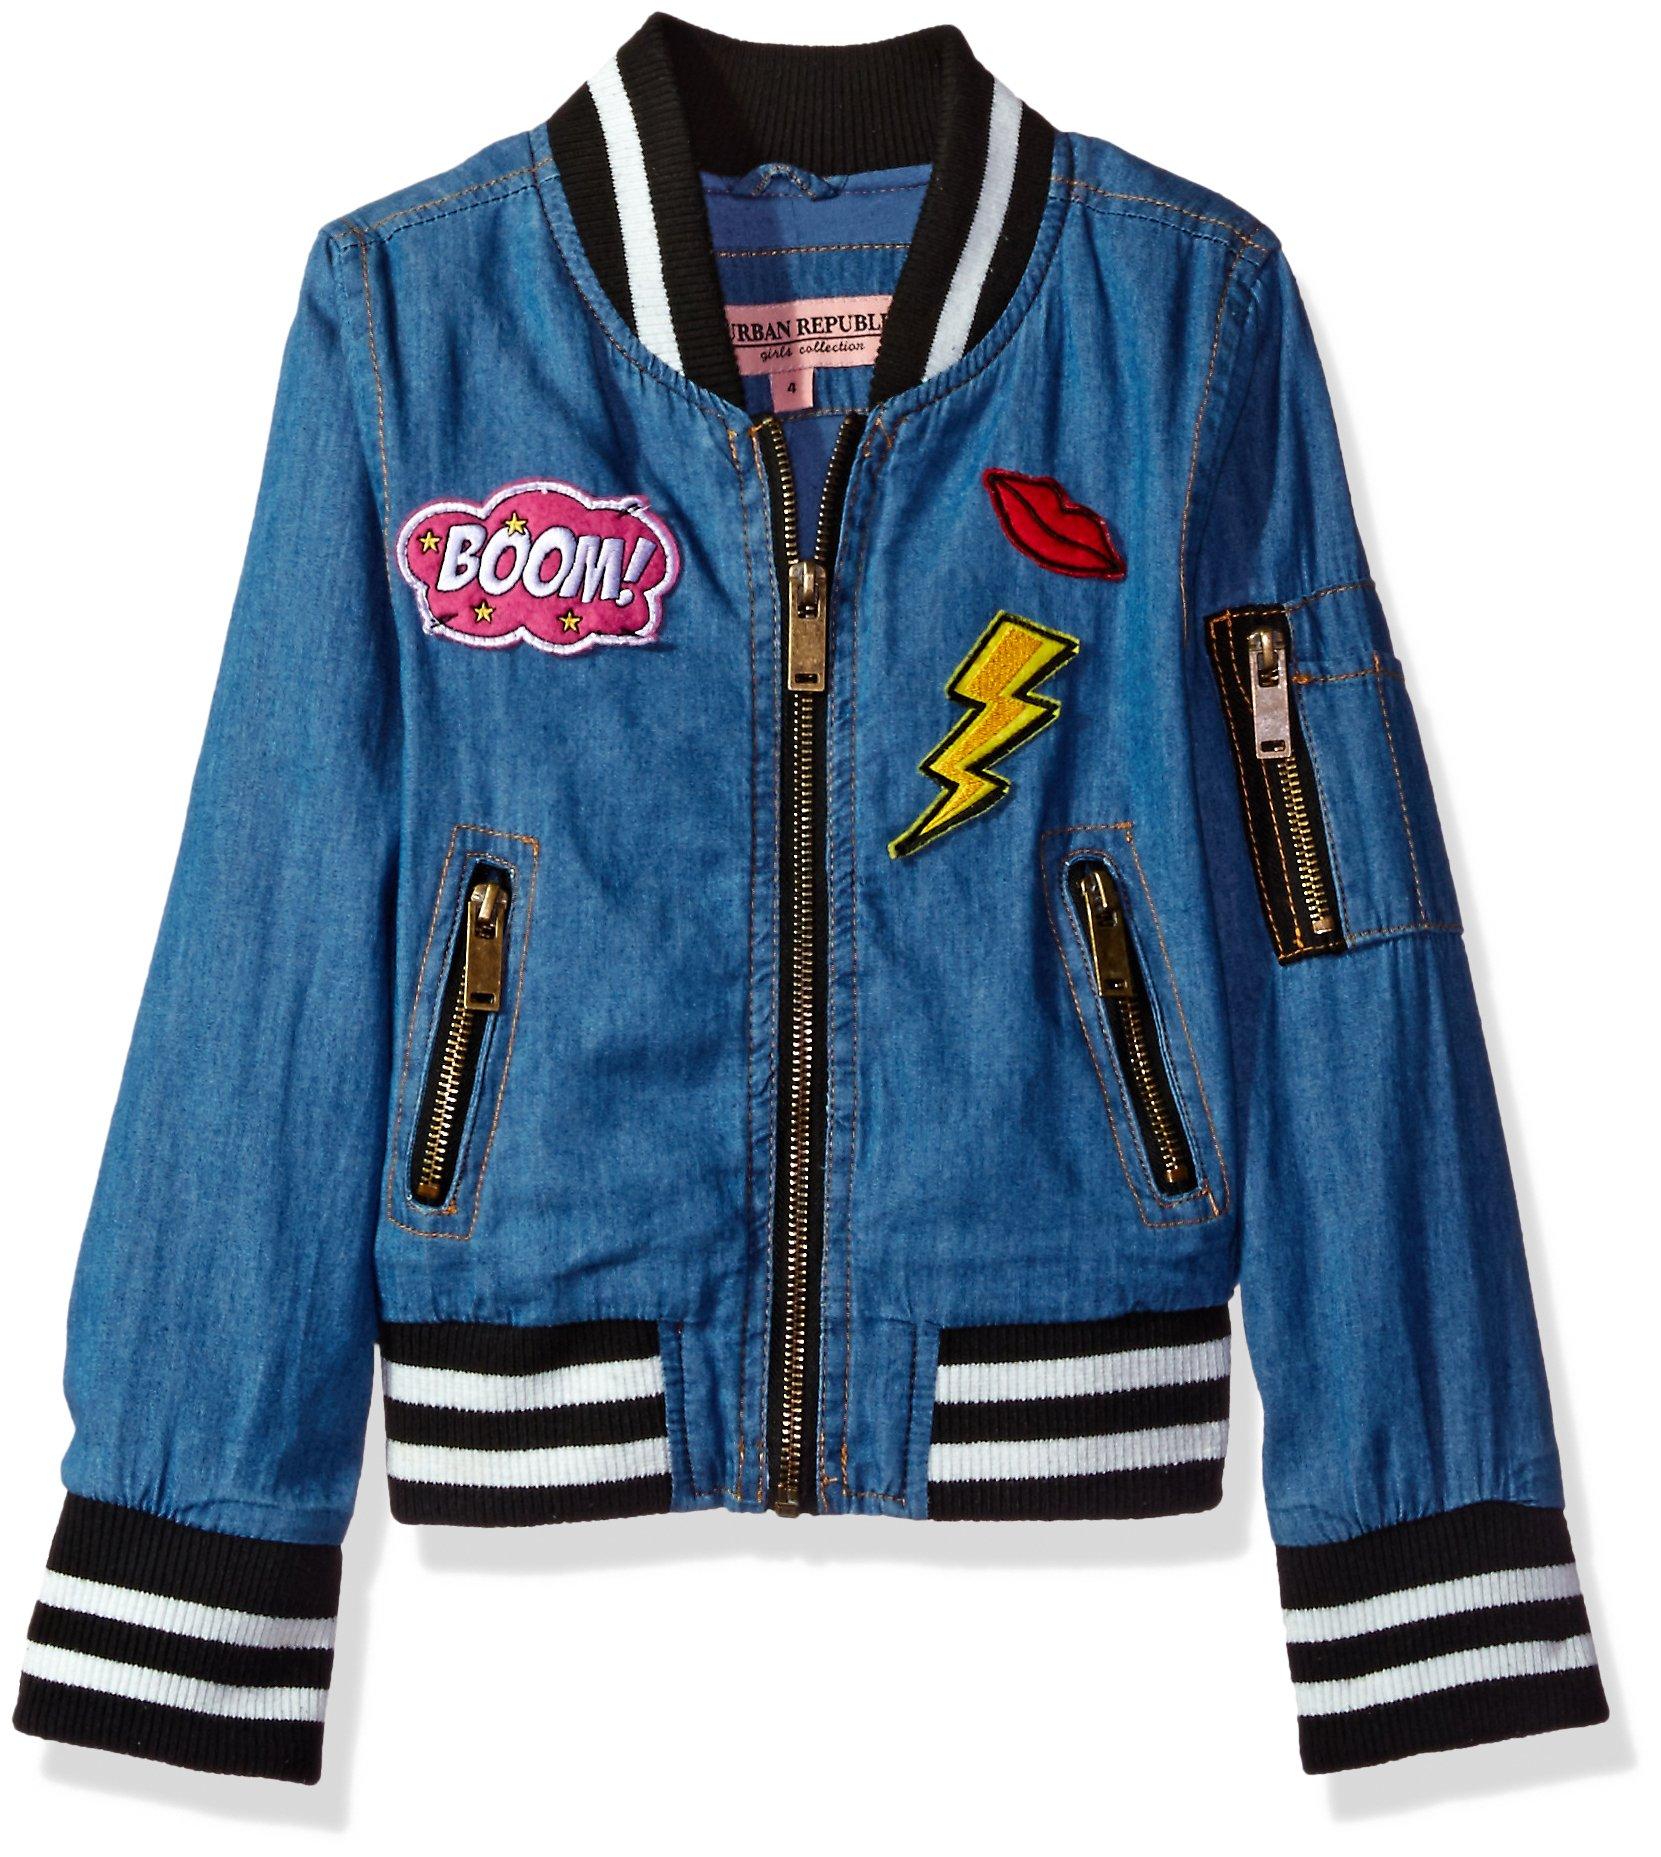 Urban Republic Little Girls' Chambray Bomber Jacket, Medium Wash, 6X